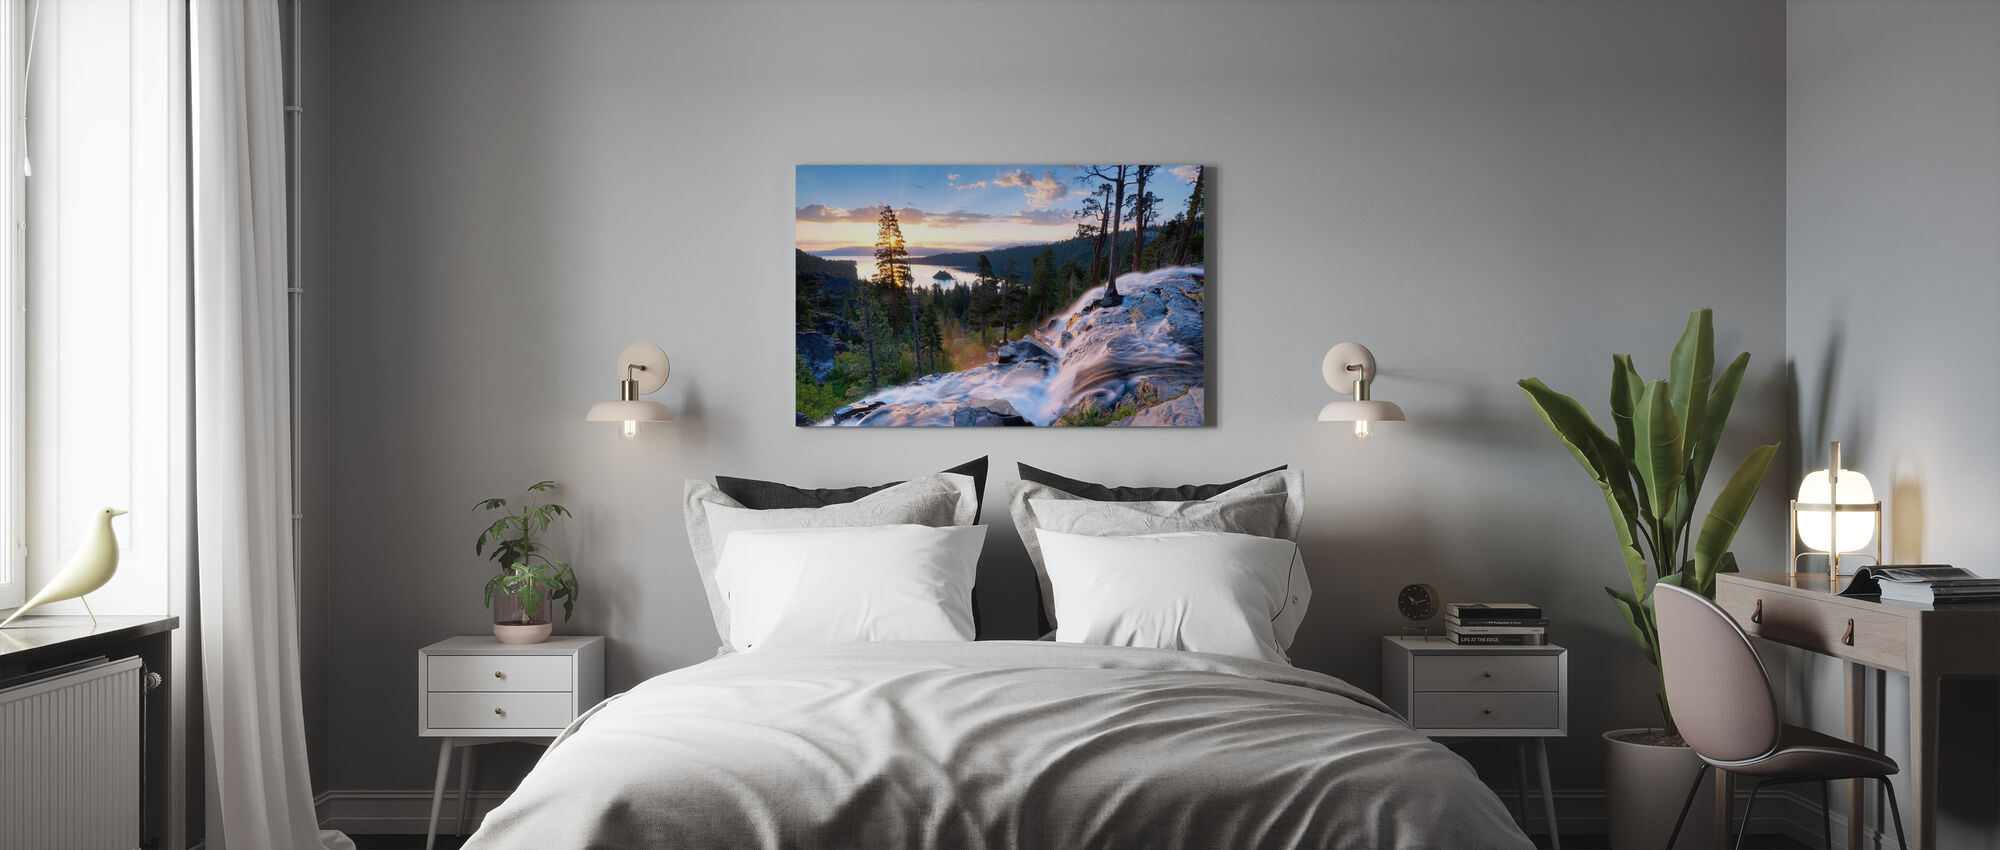 Vacker soluppgång på Eagle Falls - Canvastavla - Sovrum